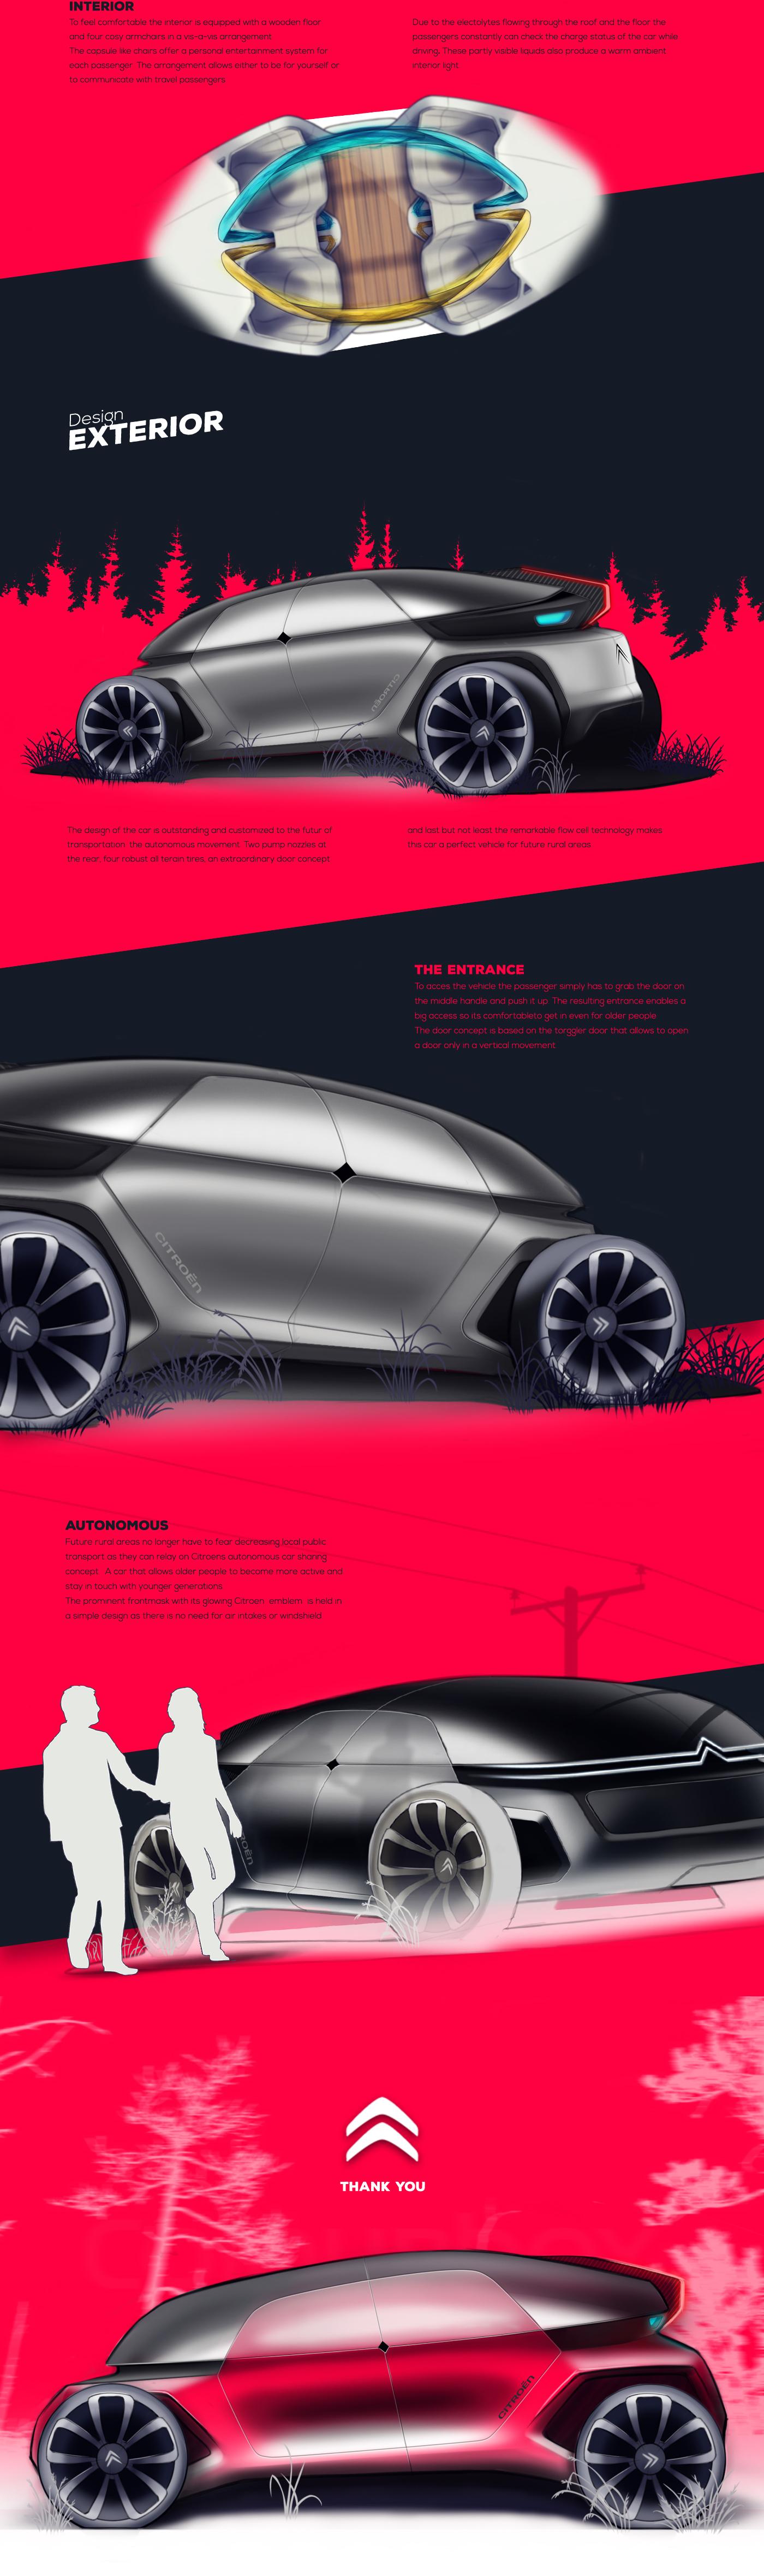 concept car,Transportation Design,Rural Mobility,Citroen Rural